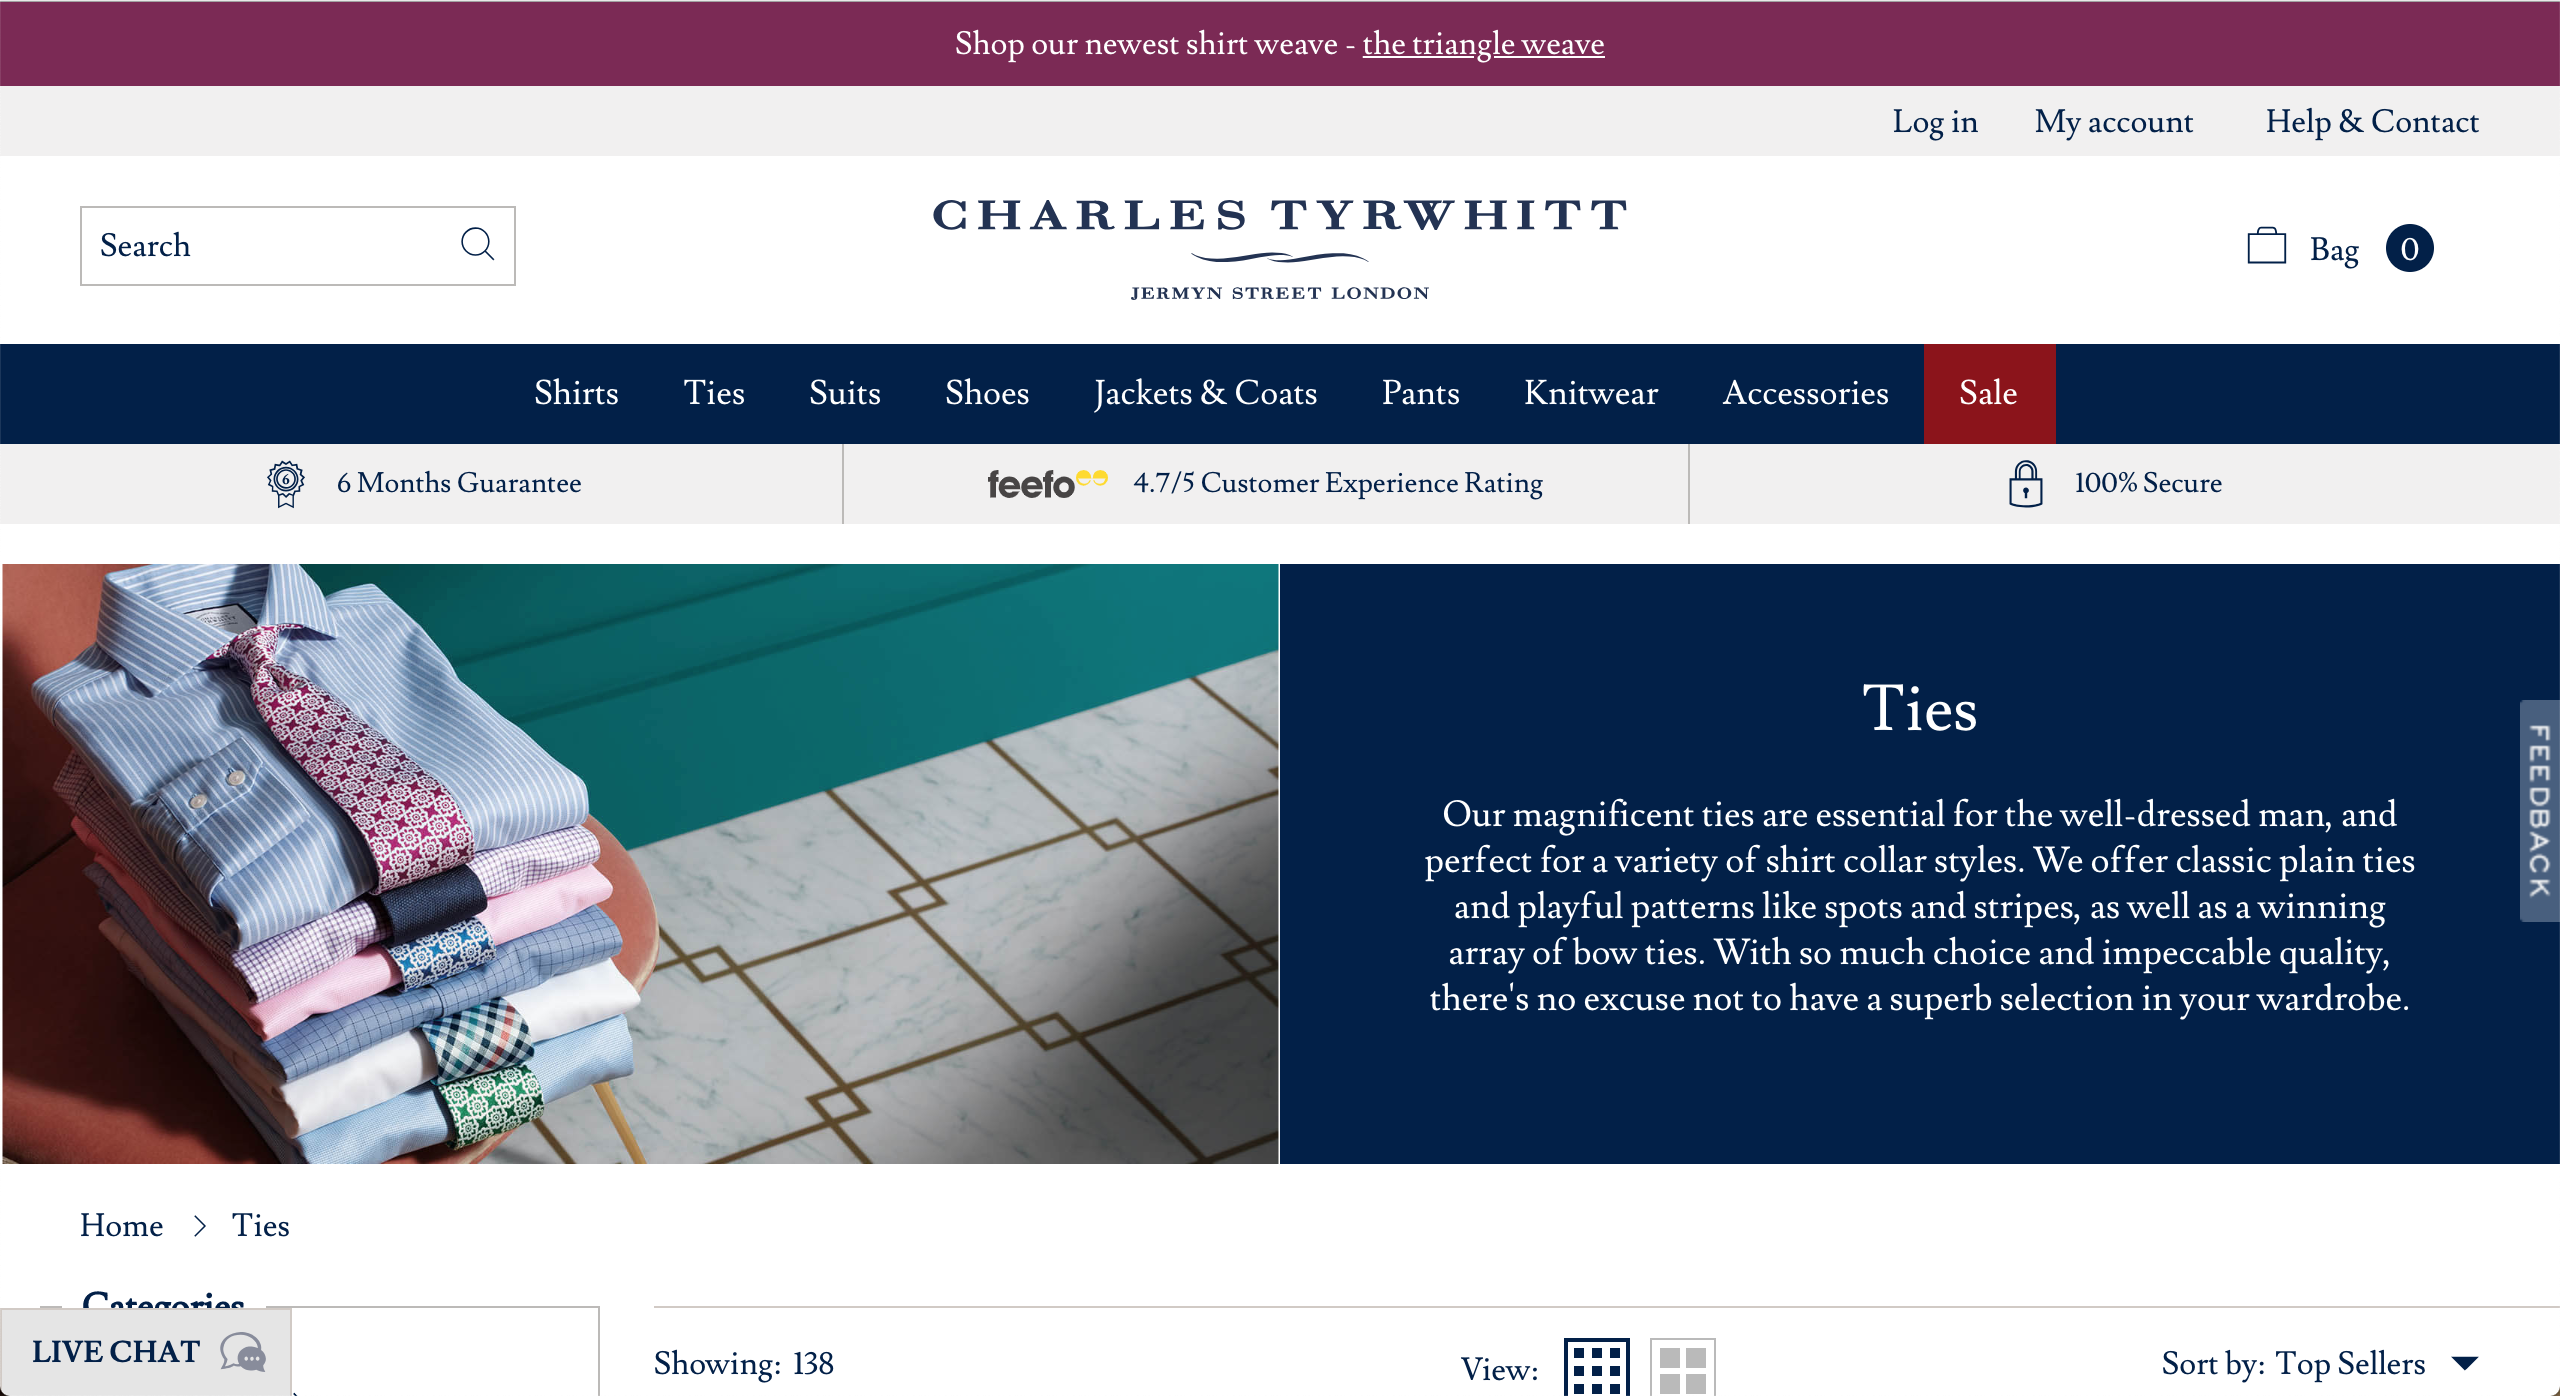 Charles Tyrwhitt ties page